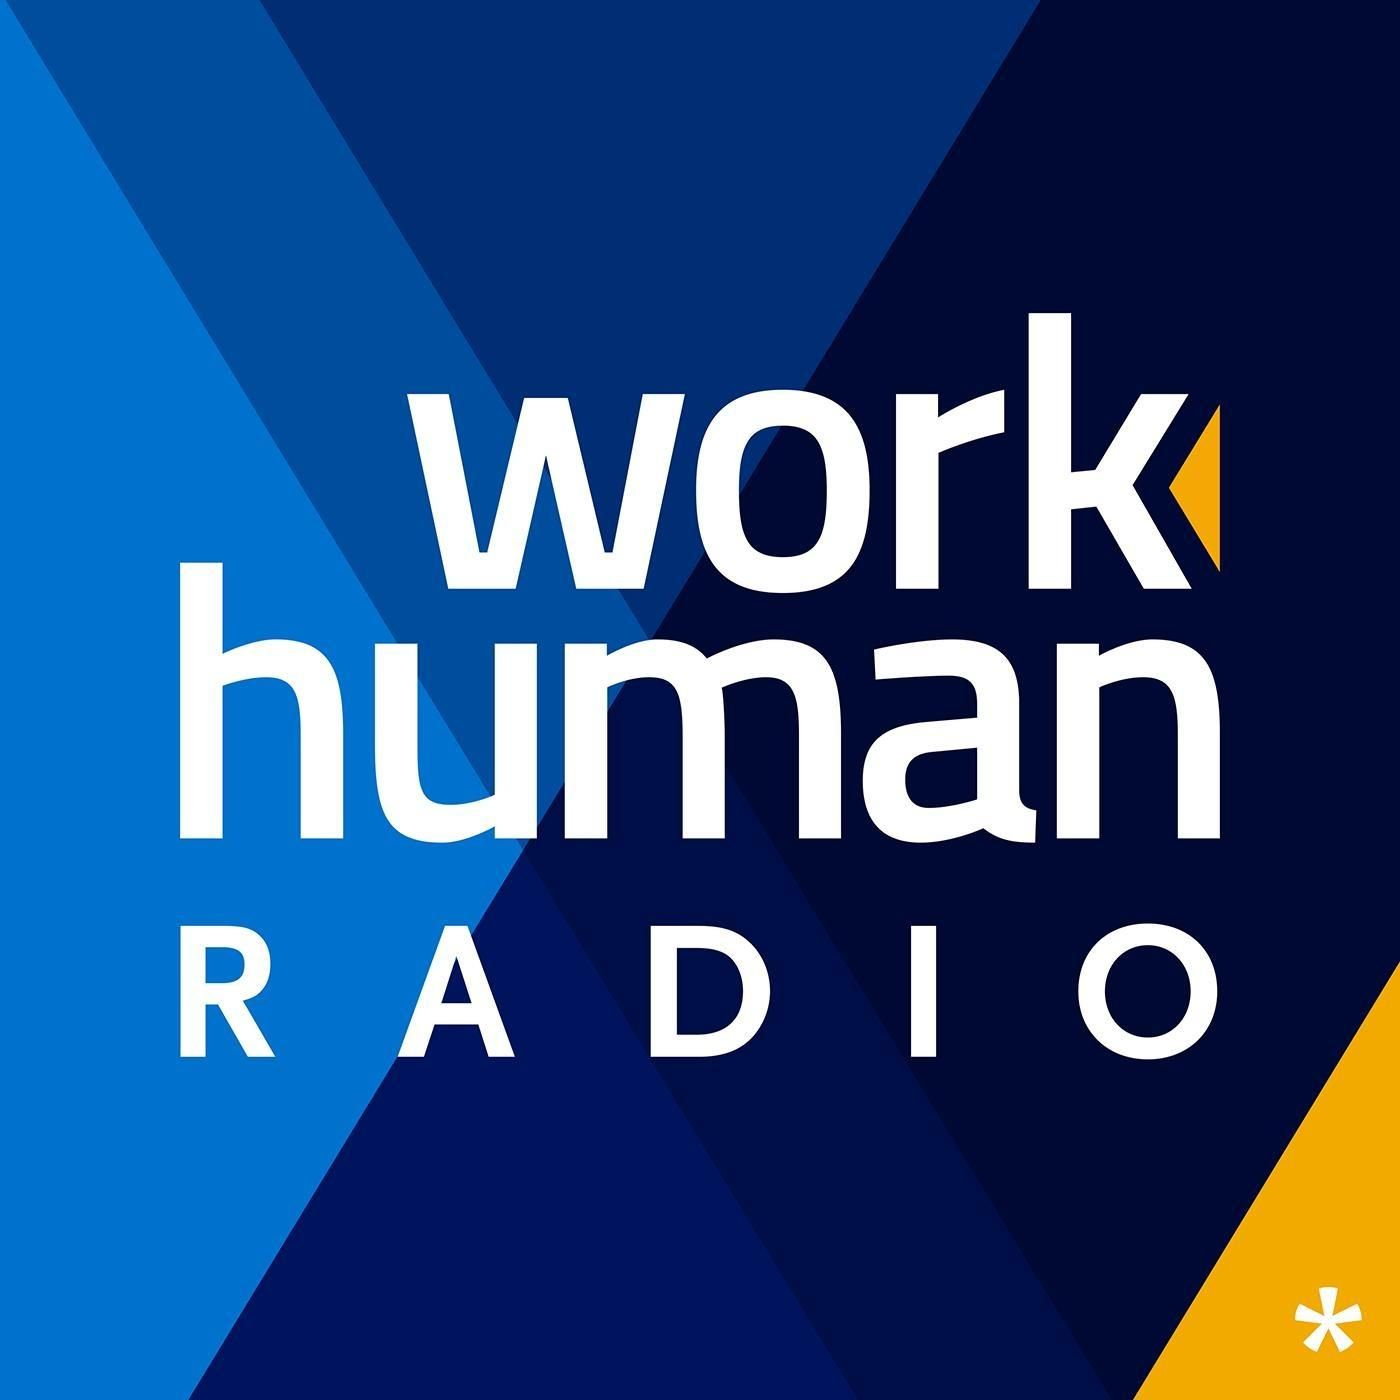 Workhuman Radio